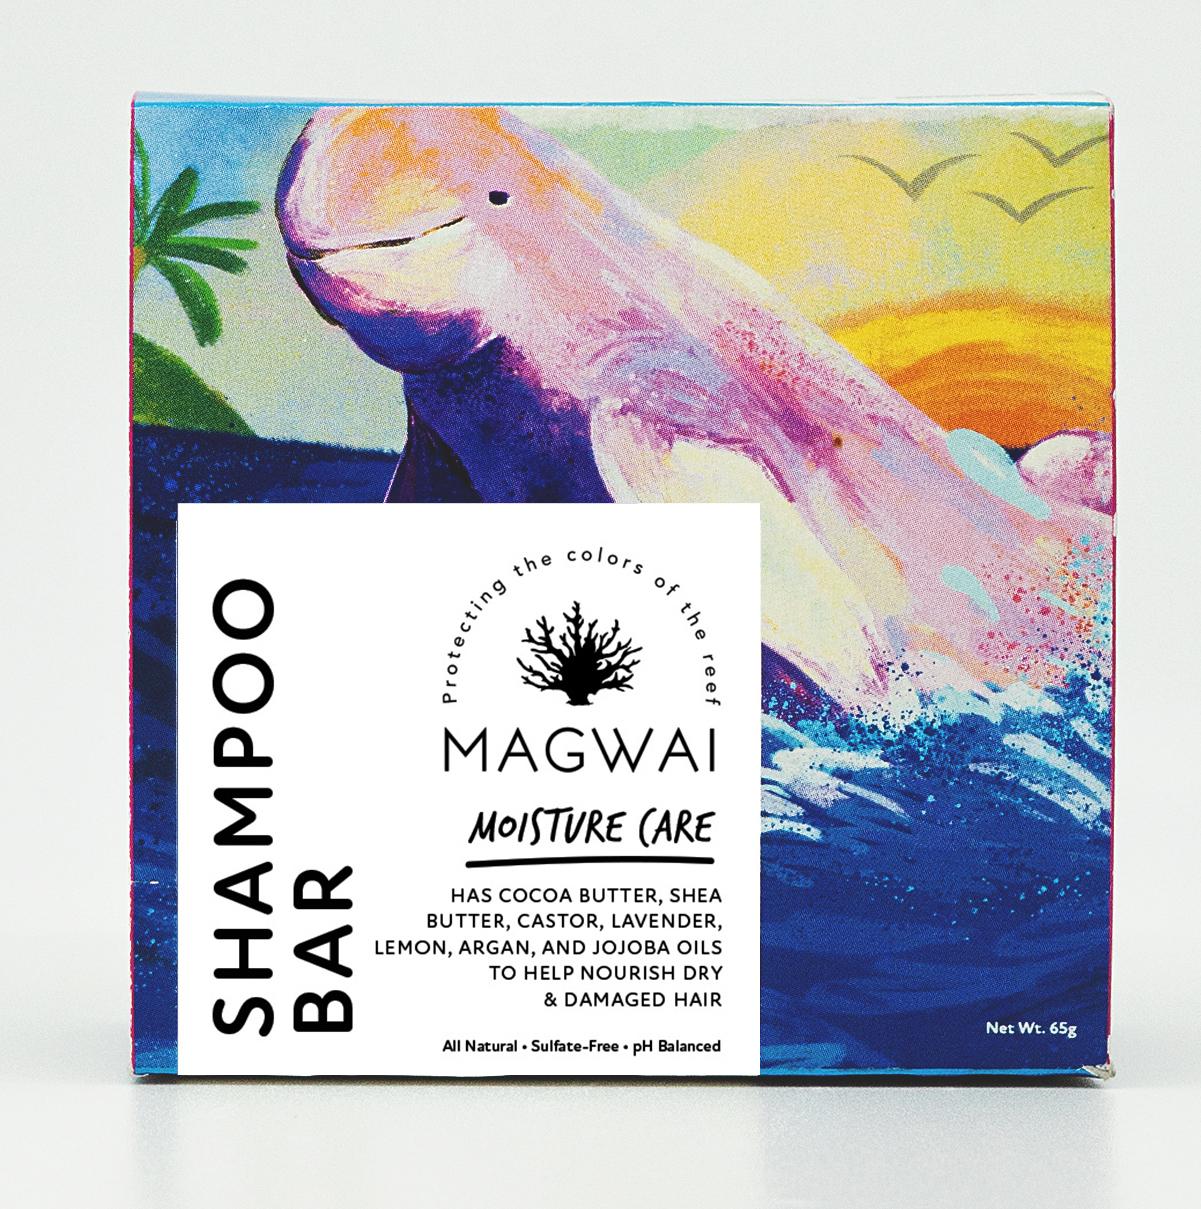 Shampoo Bar (Moisture Care) by MAGWAI